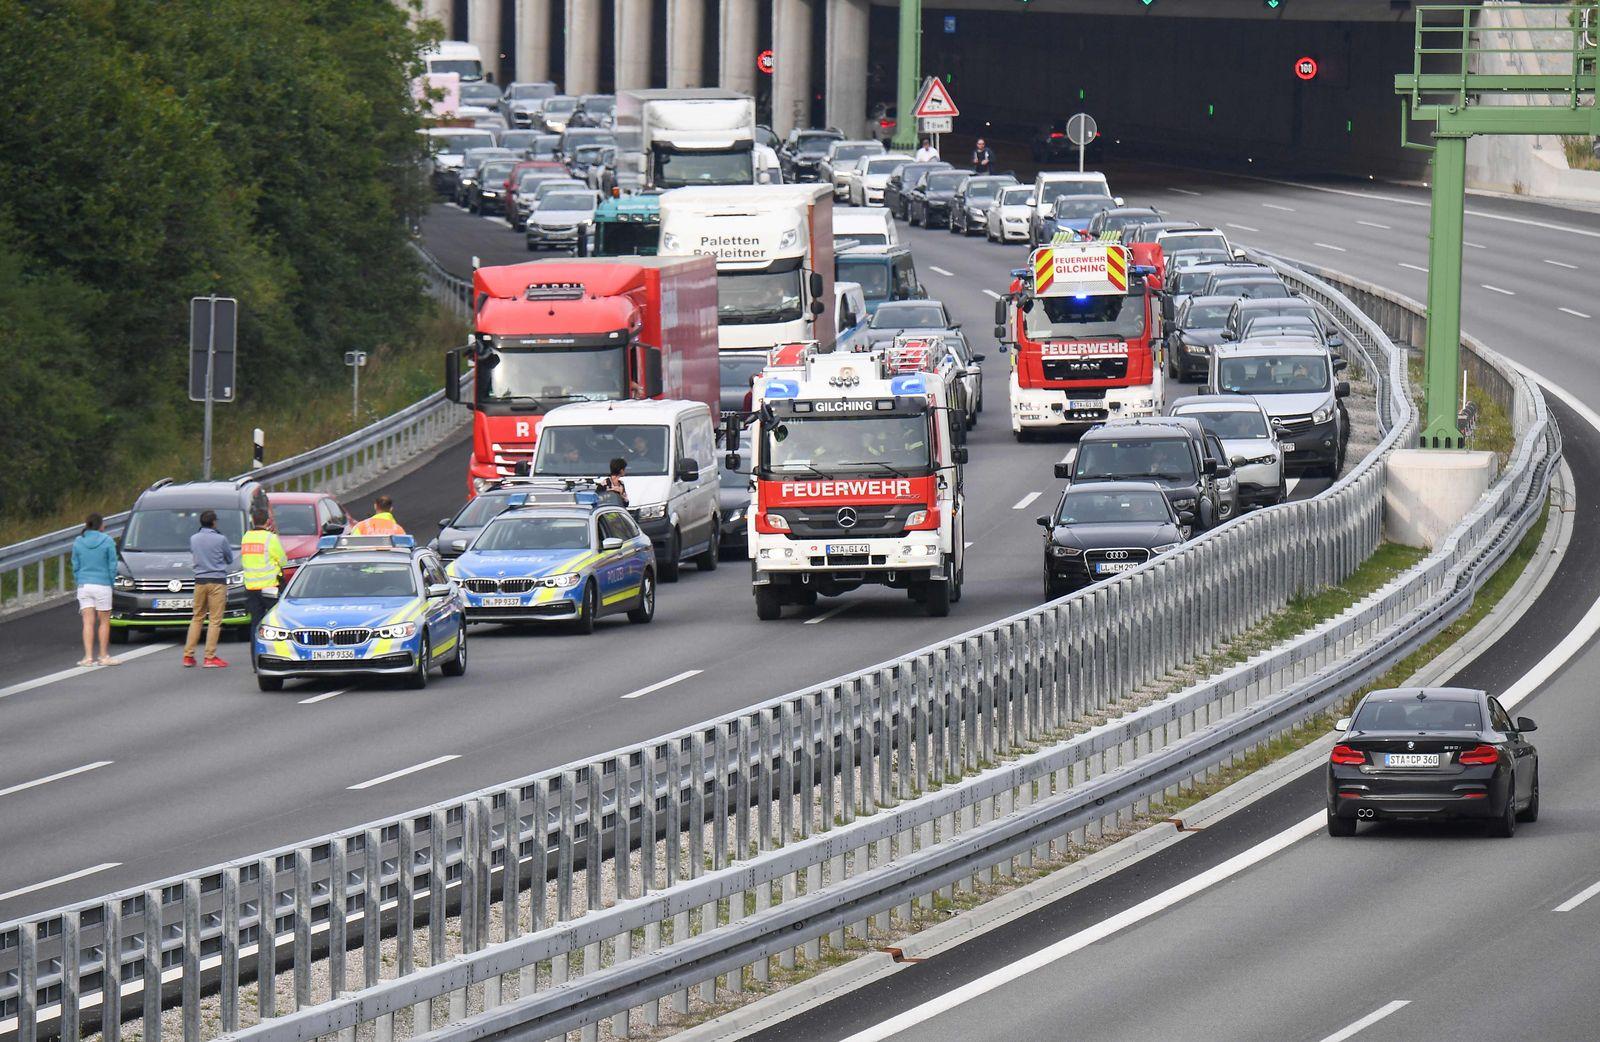 GERMANY-AUTOMOBILE-IAA-SHOW-PROTEST